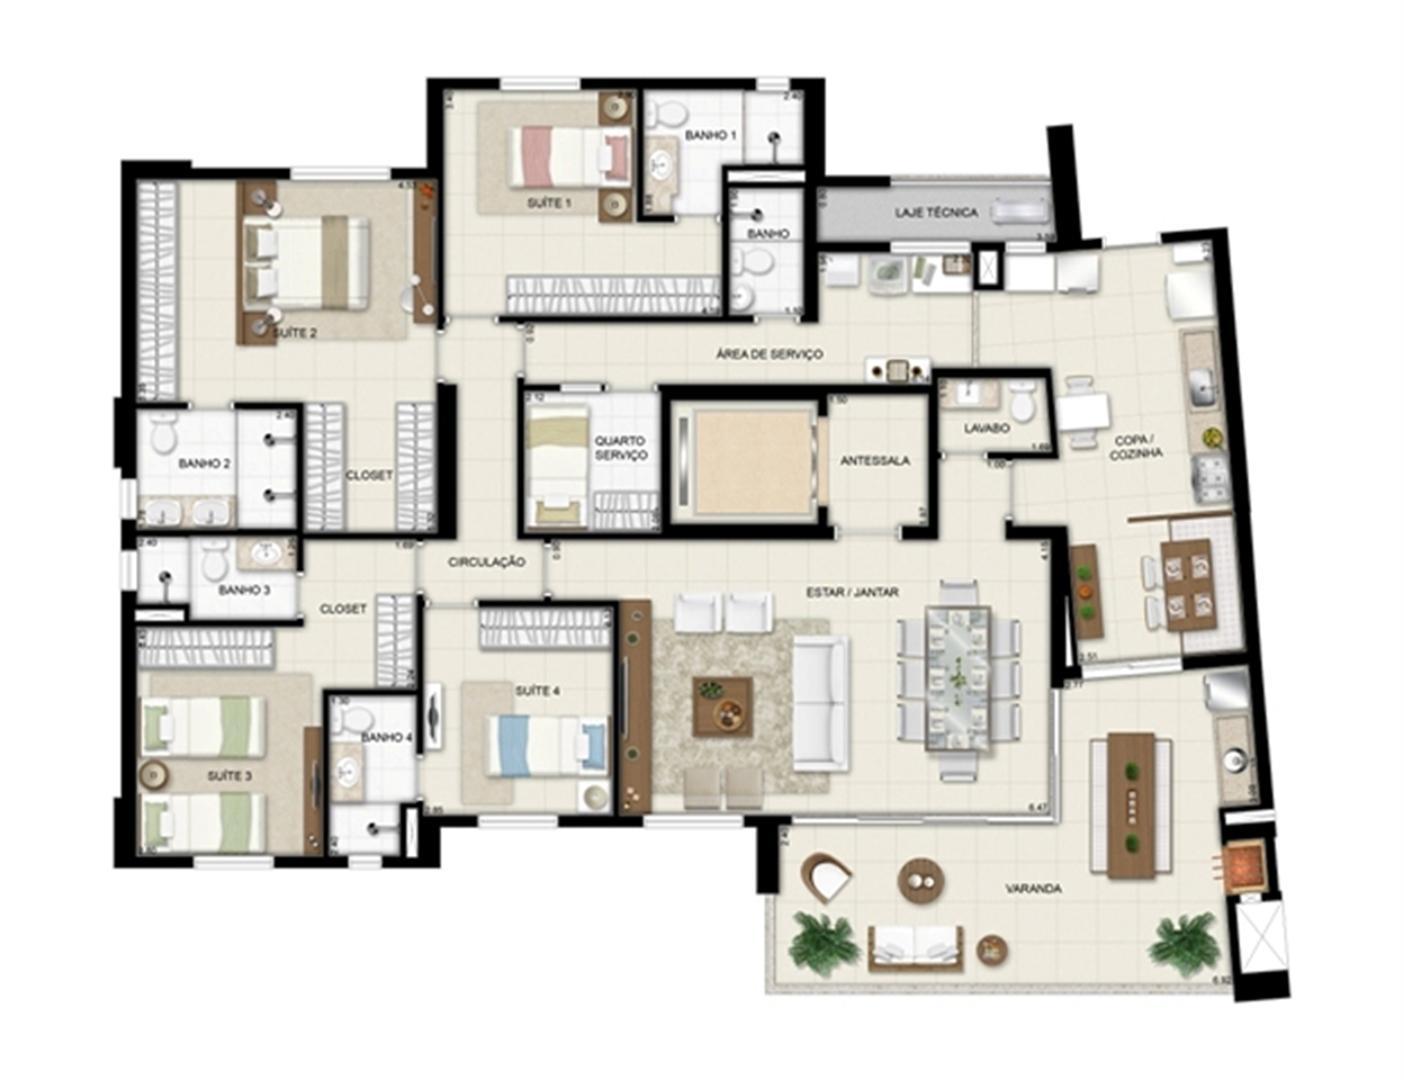 Planta tipo - Torre Boulevard - Final 01 198 m² | Chateau Marista LifeStyle – Apartamento no  Setor Marista - Goiânia - Goiás